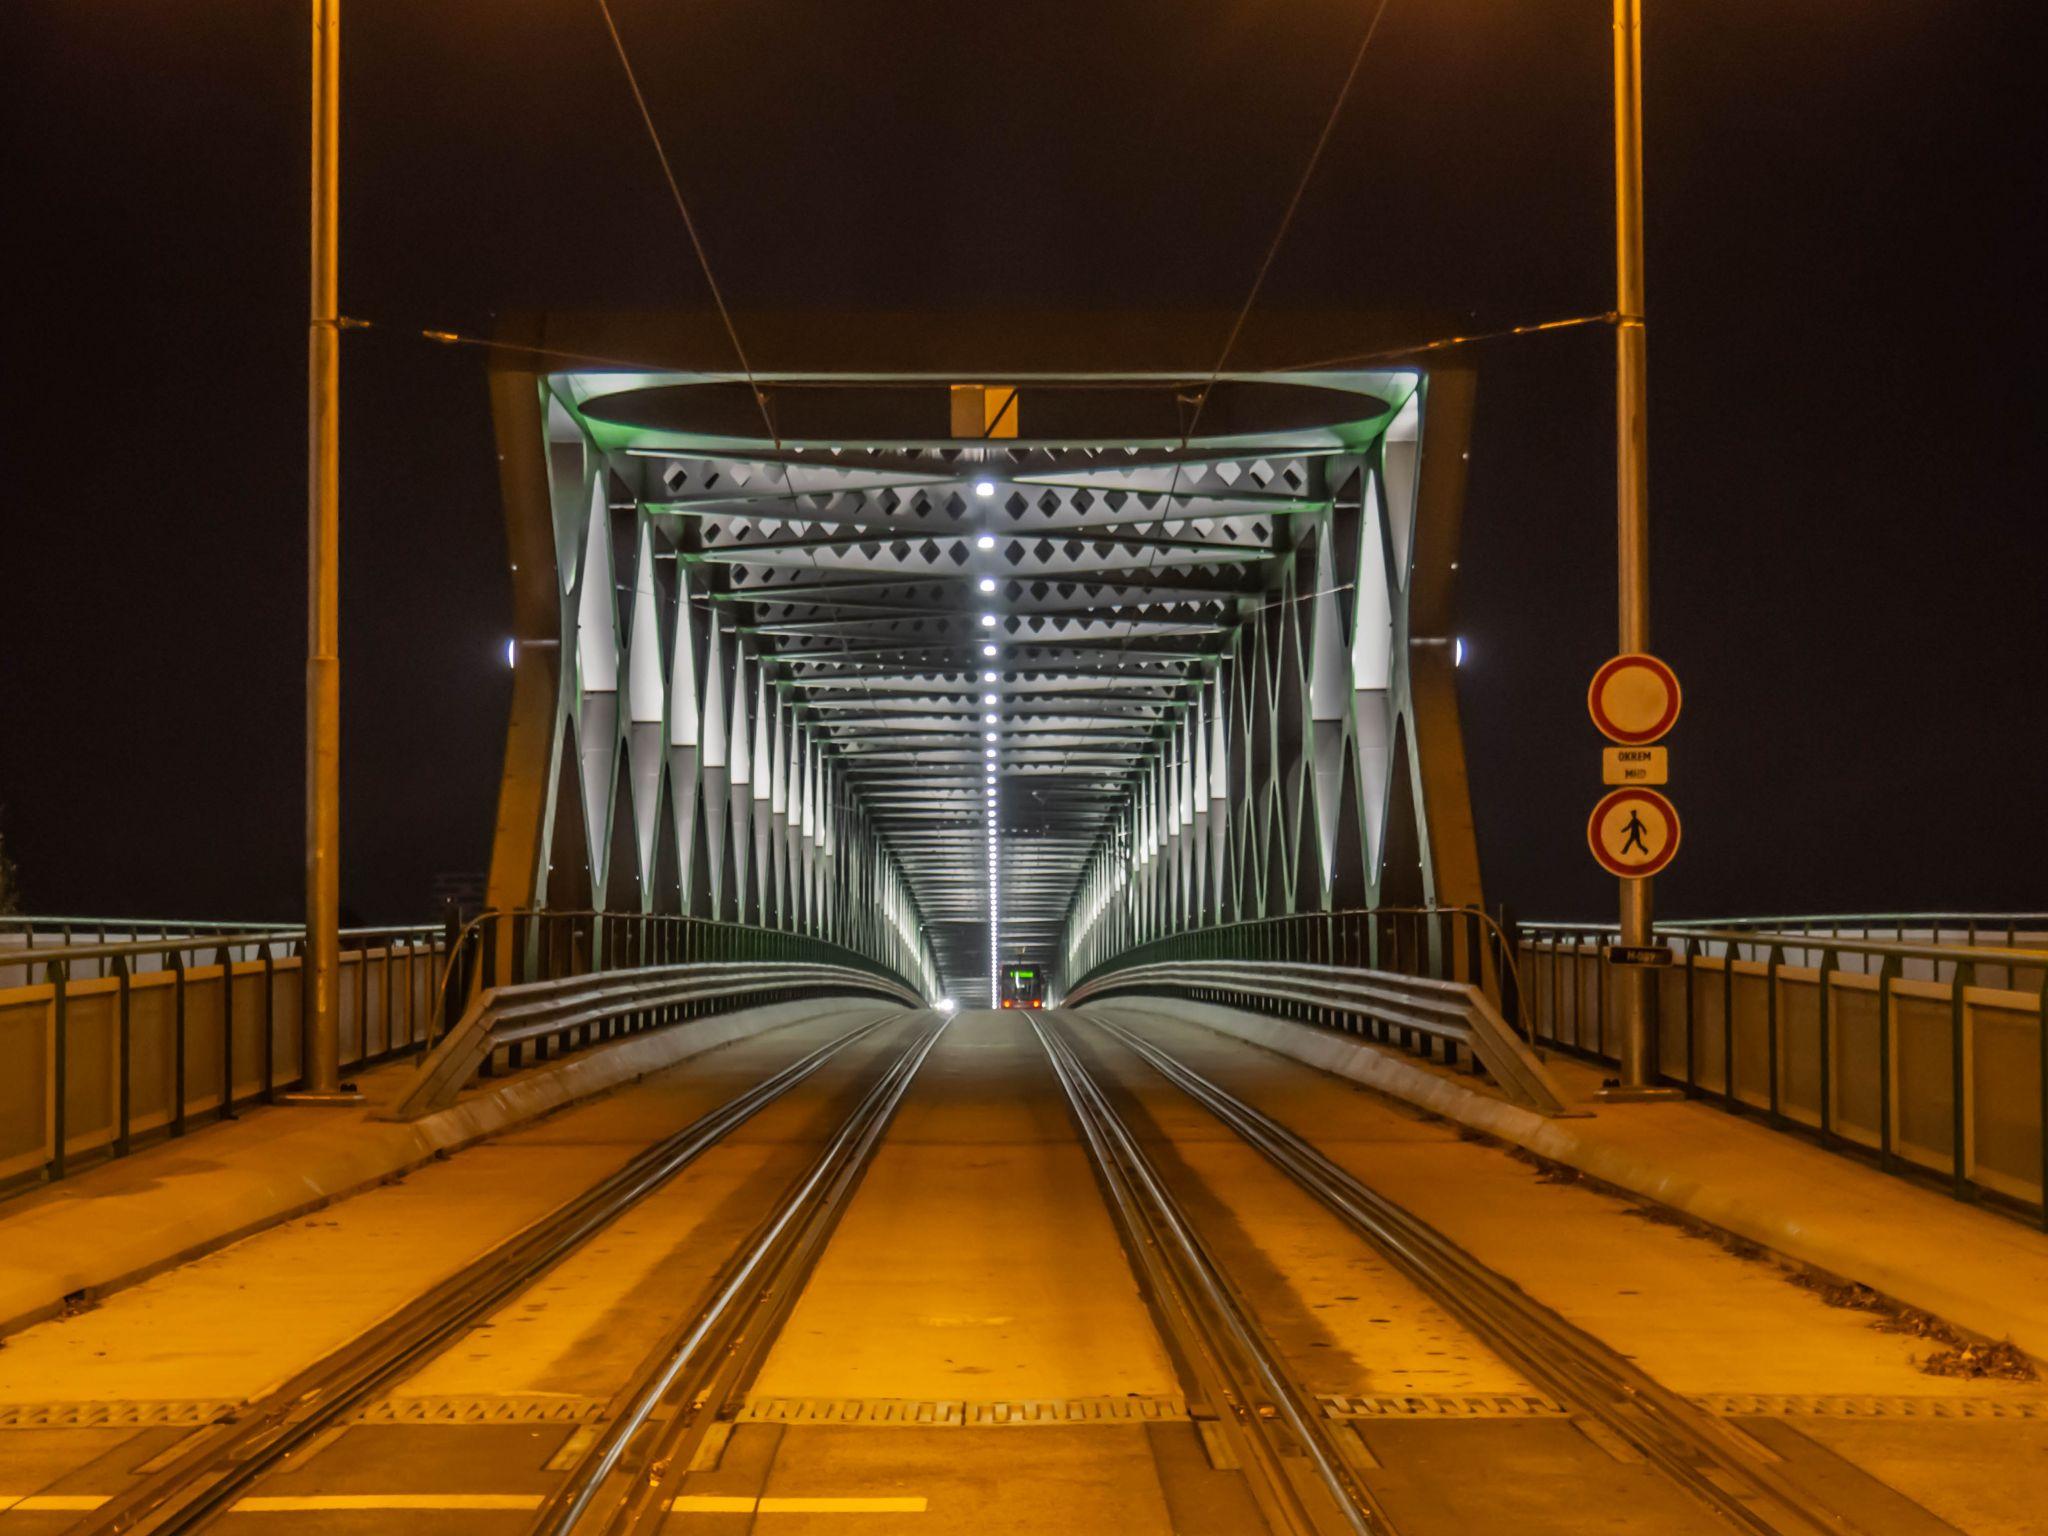 Tunnel bridge, Slovakia (Slovak Republic)